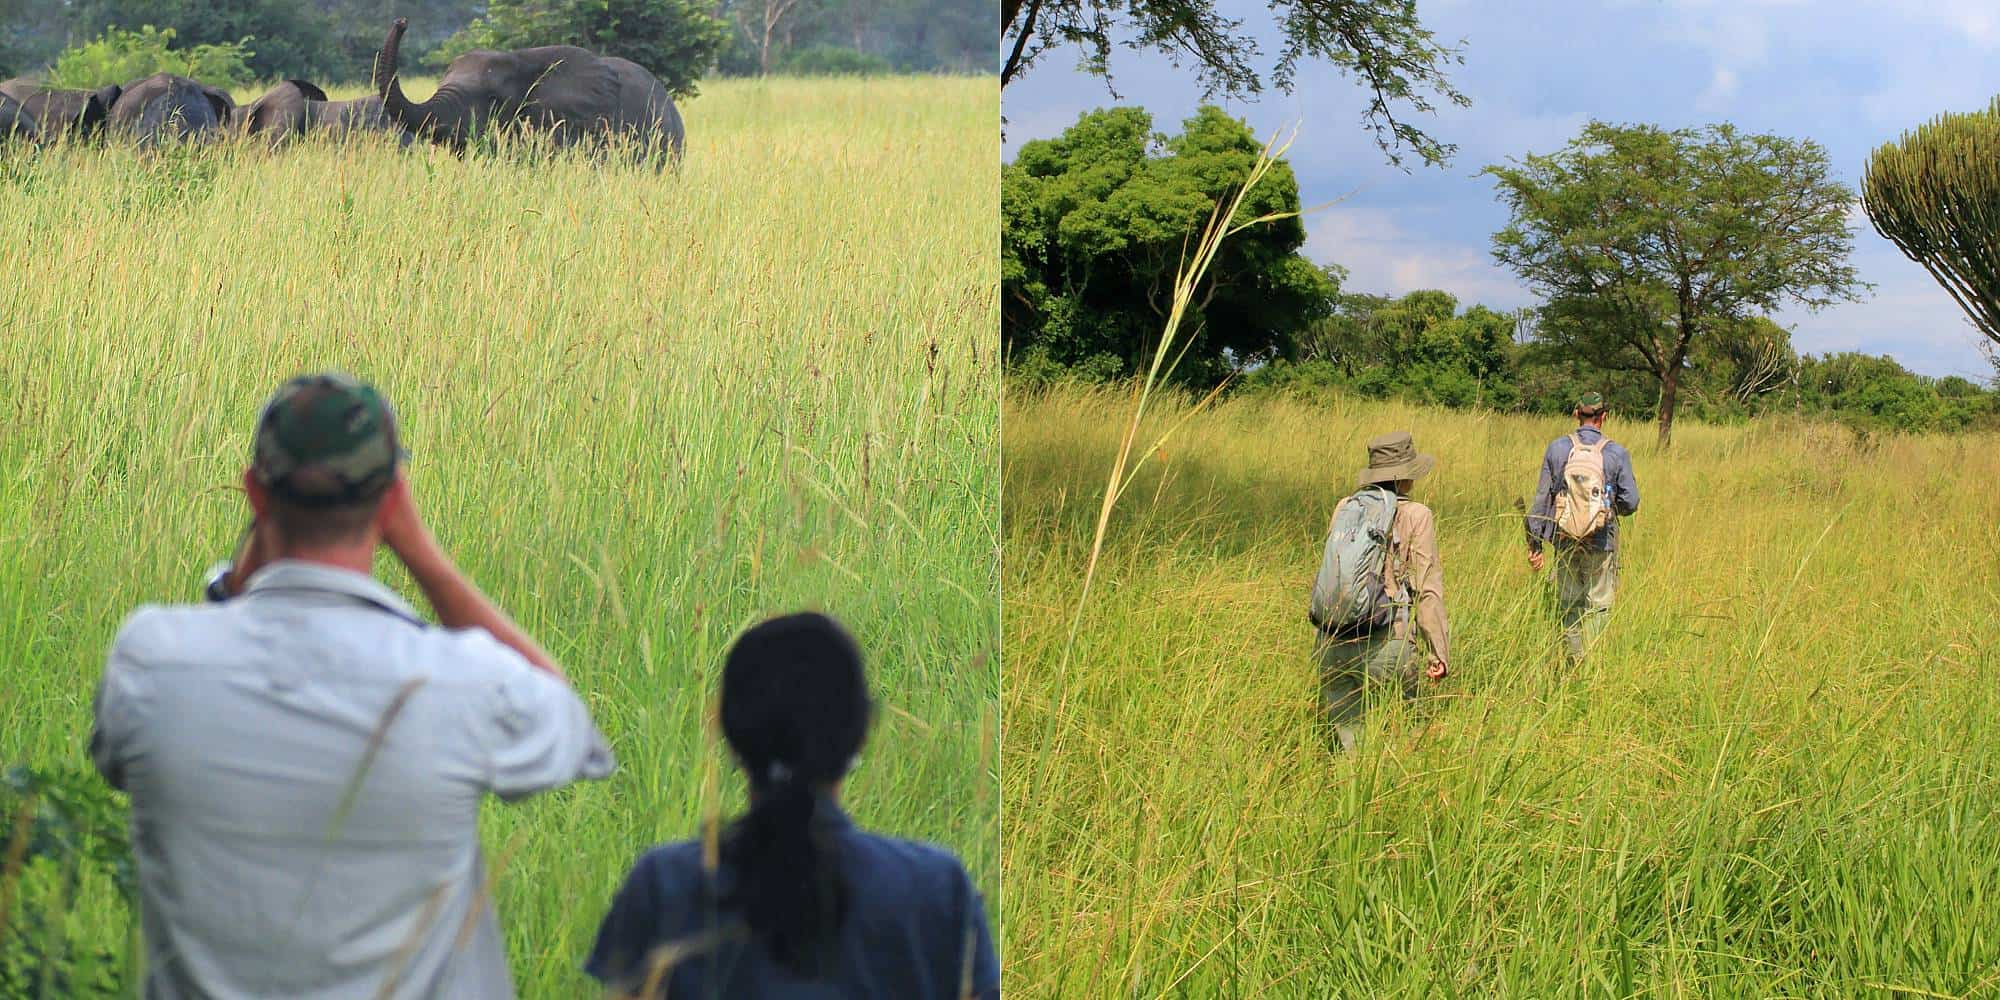 Nature Walks, Hikes-Treks, Bush Walk Safaris In Semliki Reserve